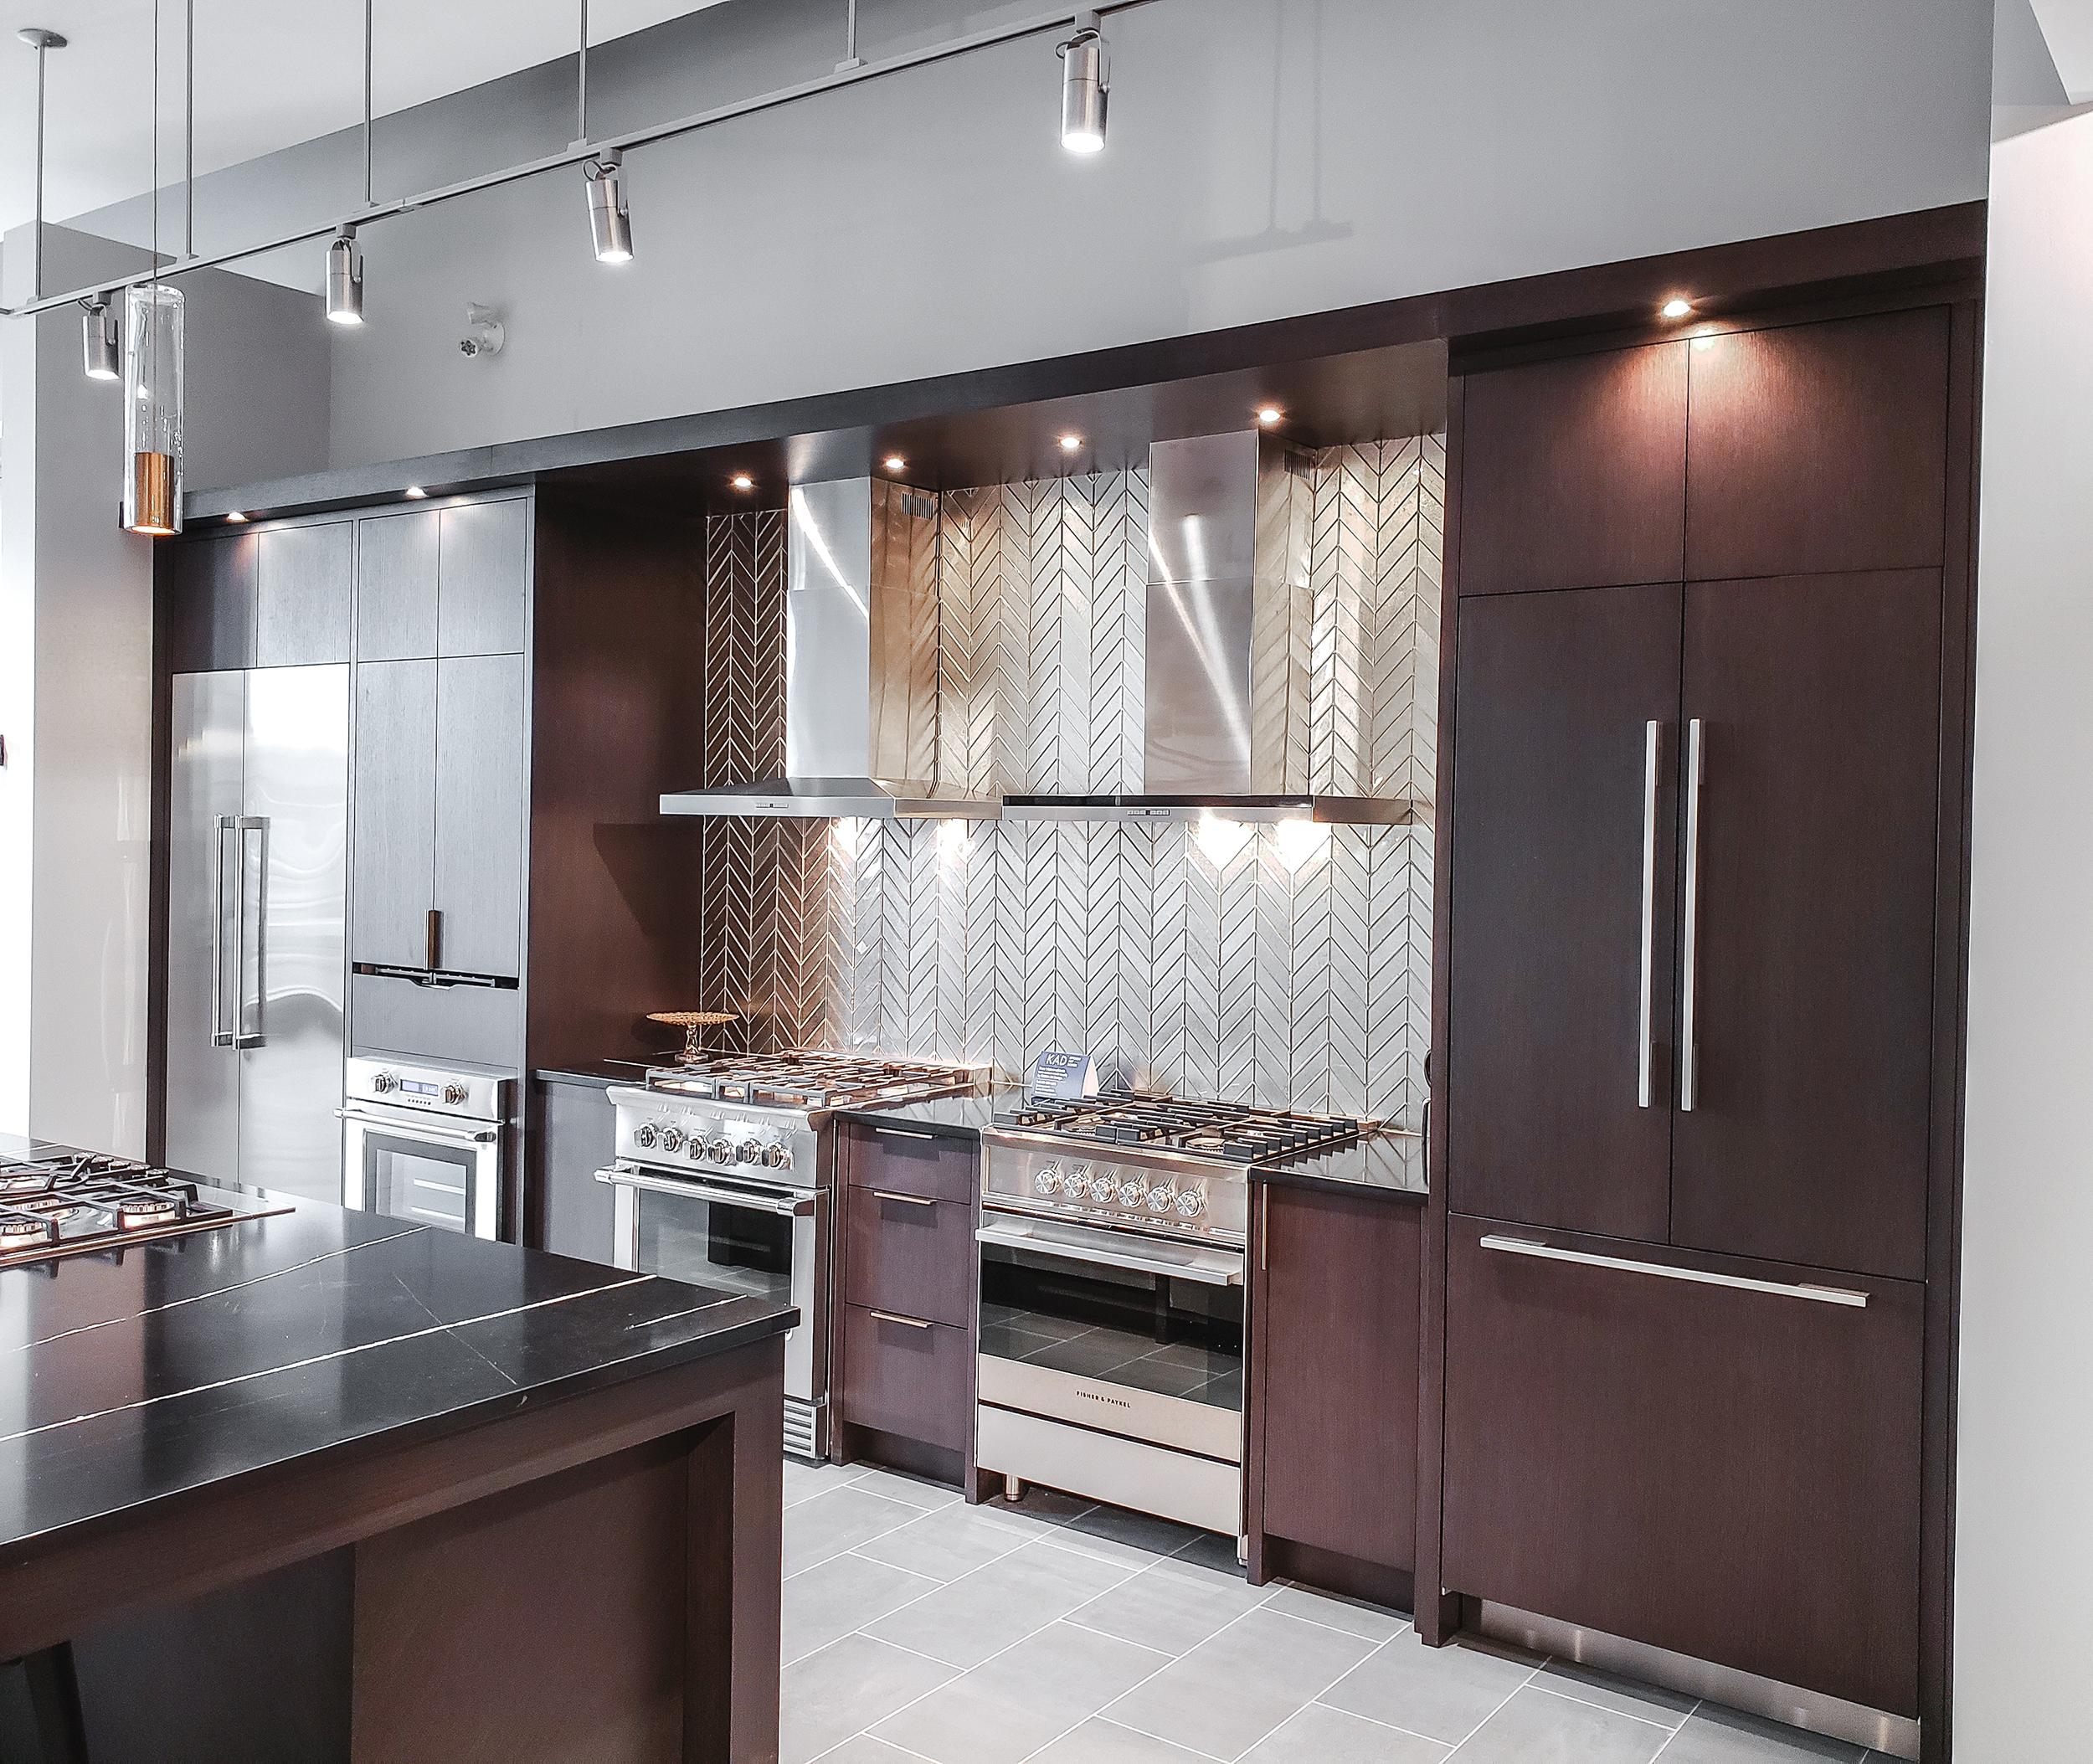 Inspiring Kitchen Design Styles for 2021 3